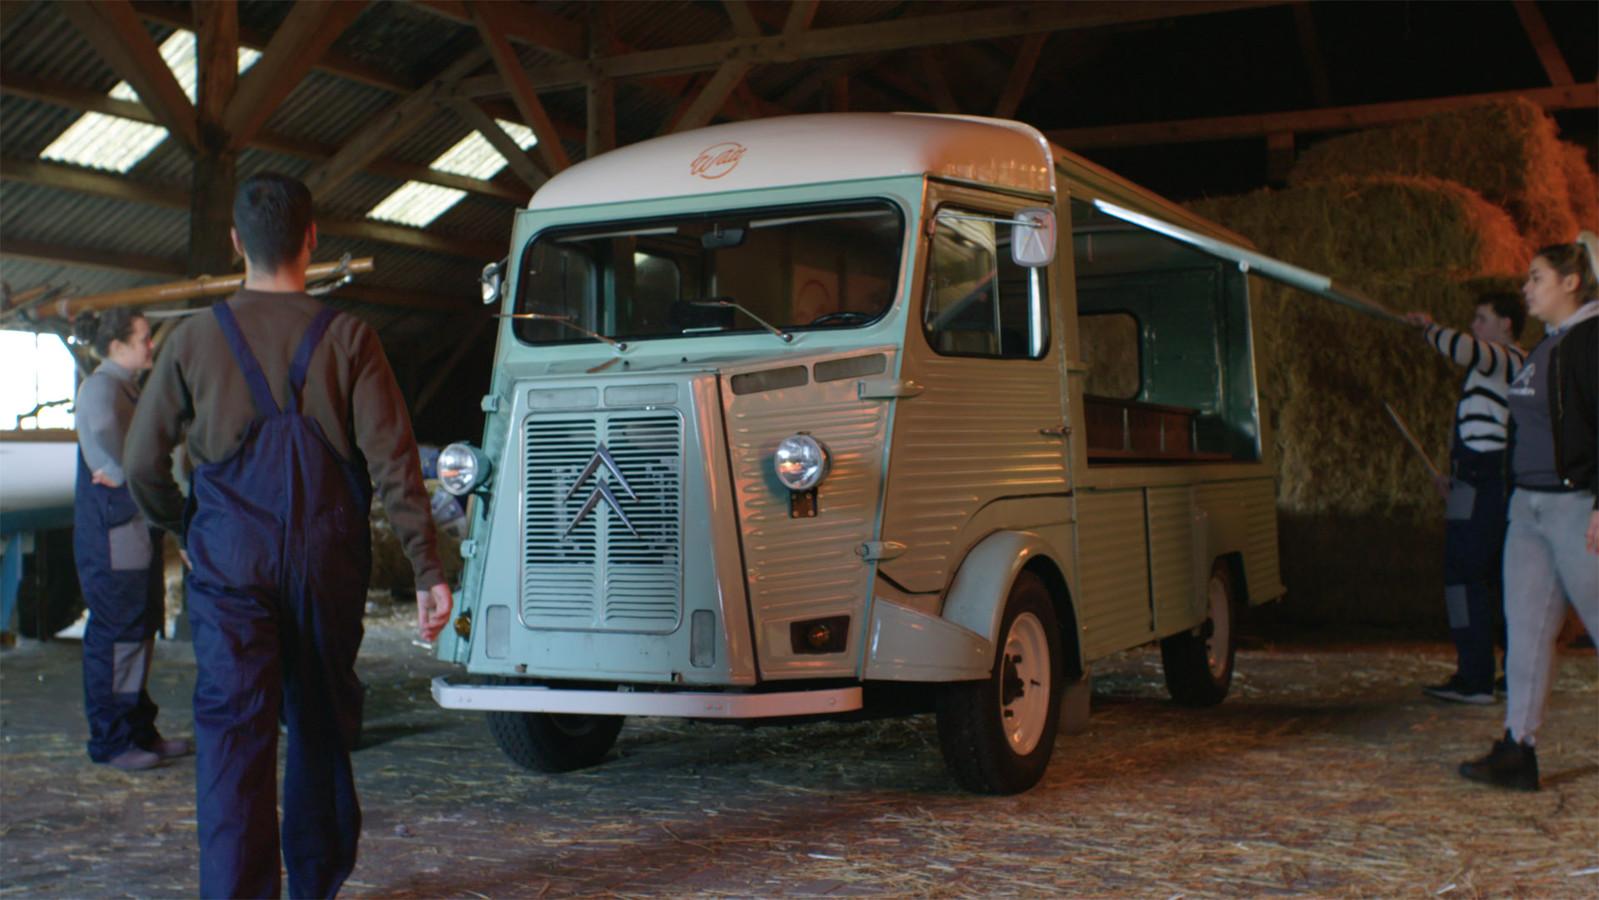 De tot foodtruck omgebouwde Citroën HY